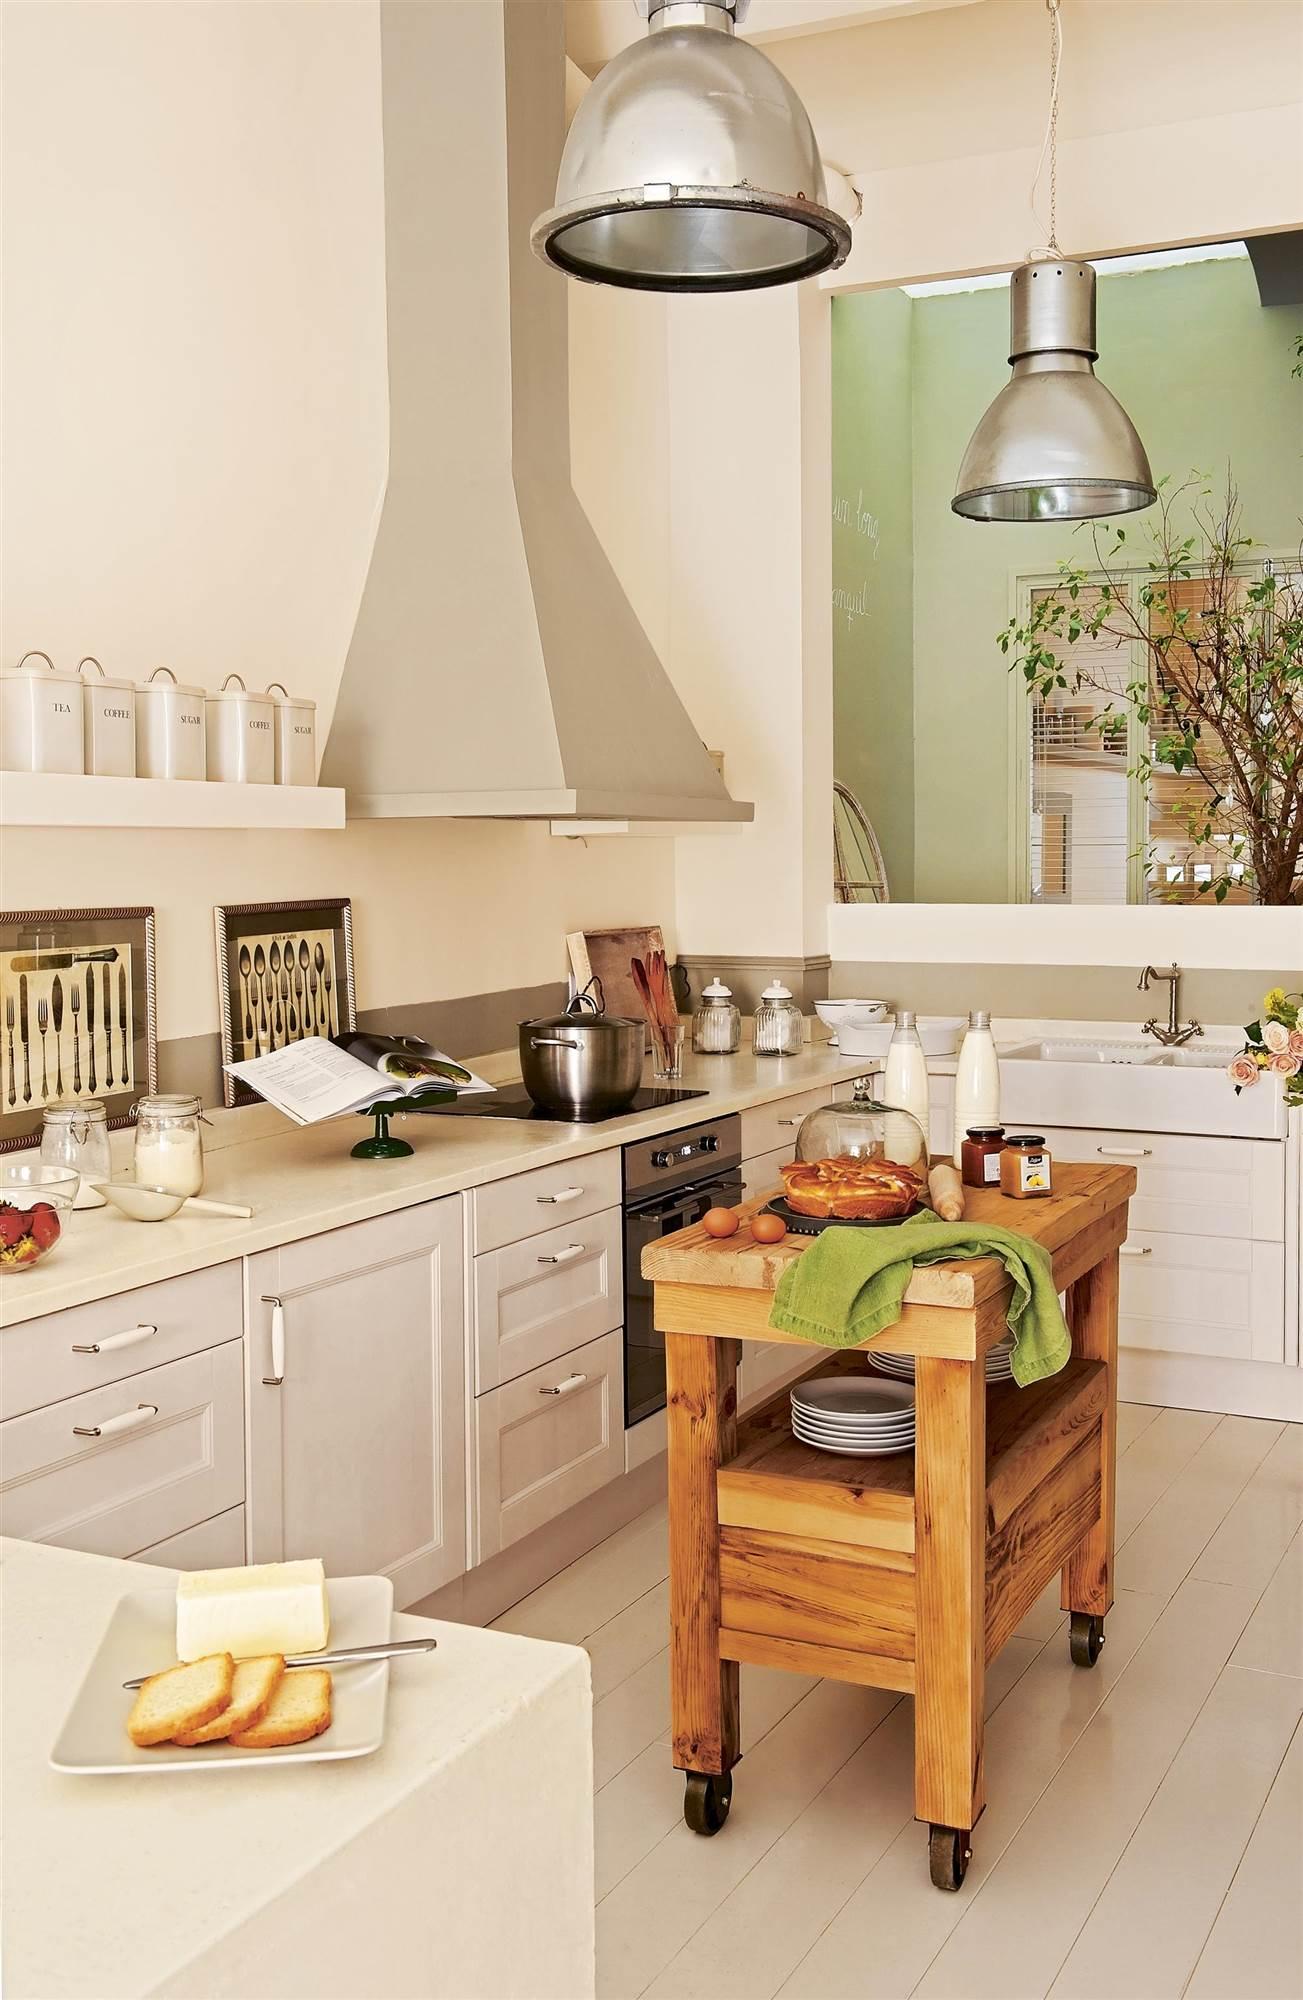 Muebles de cocina elmueble - Cocinas por 2000 euros ...